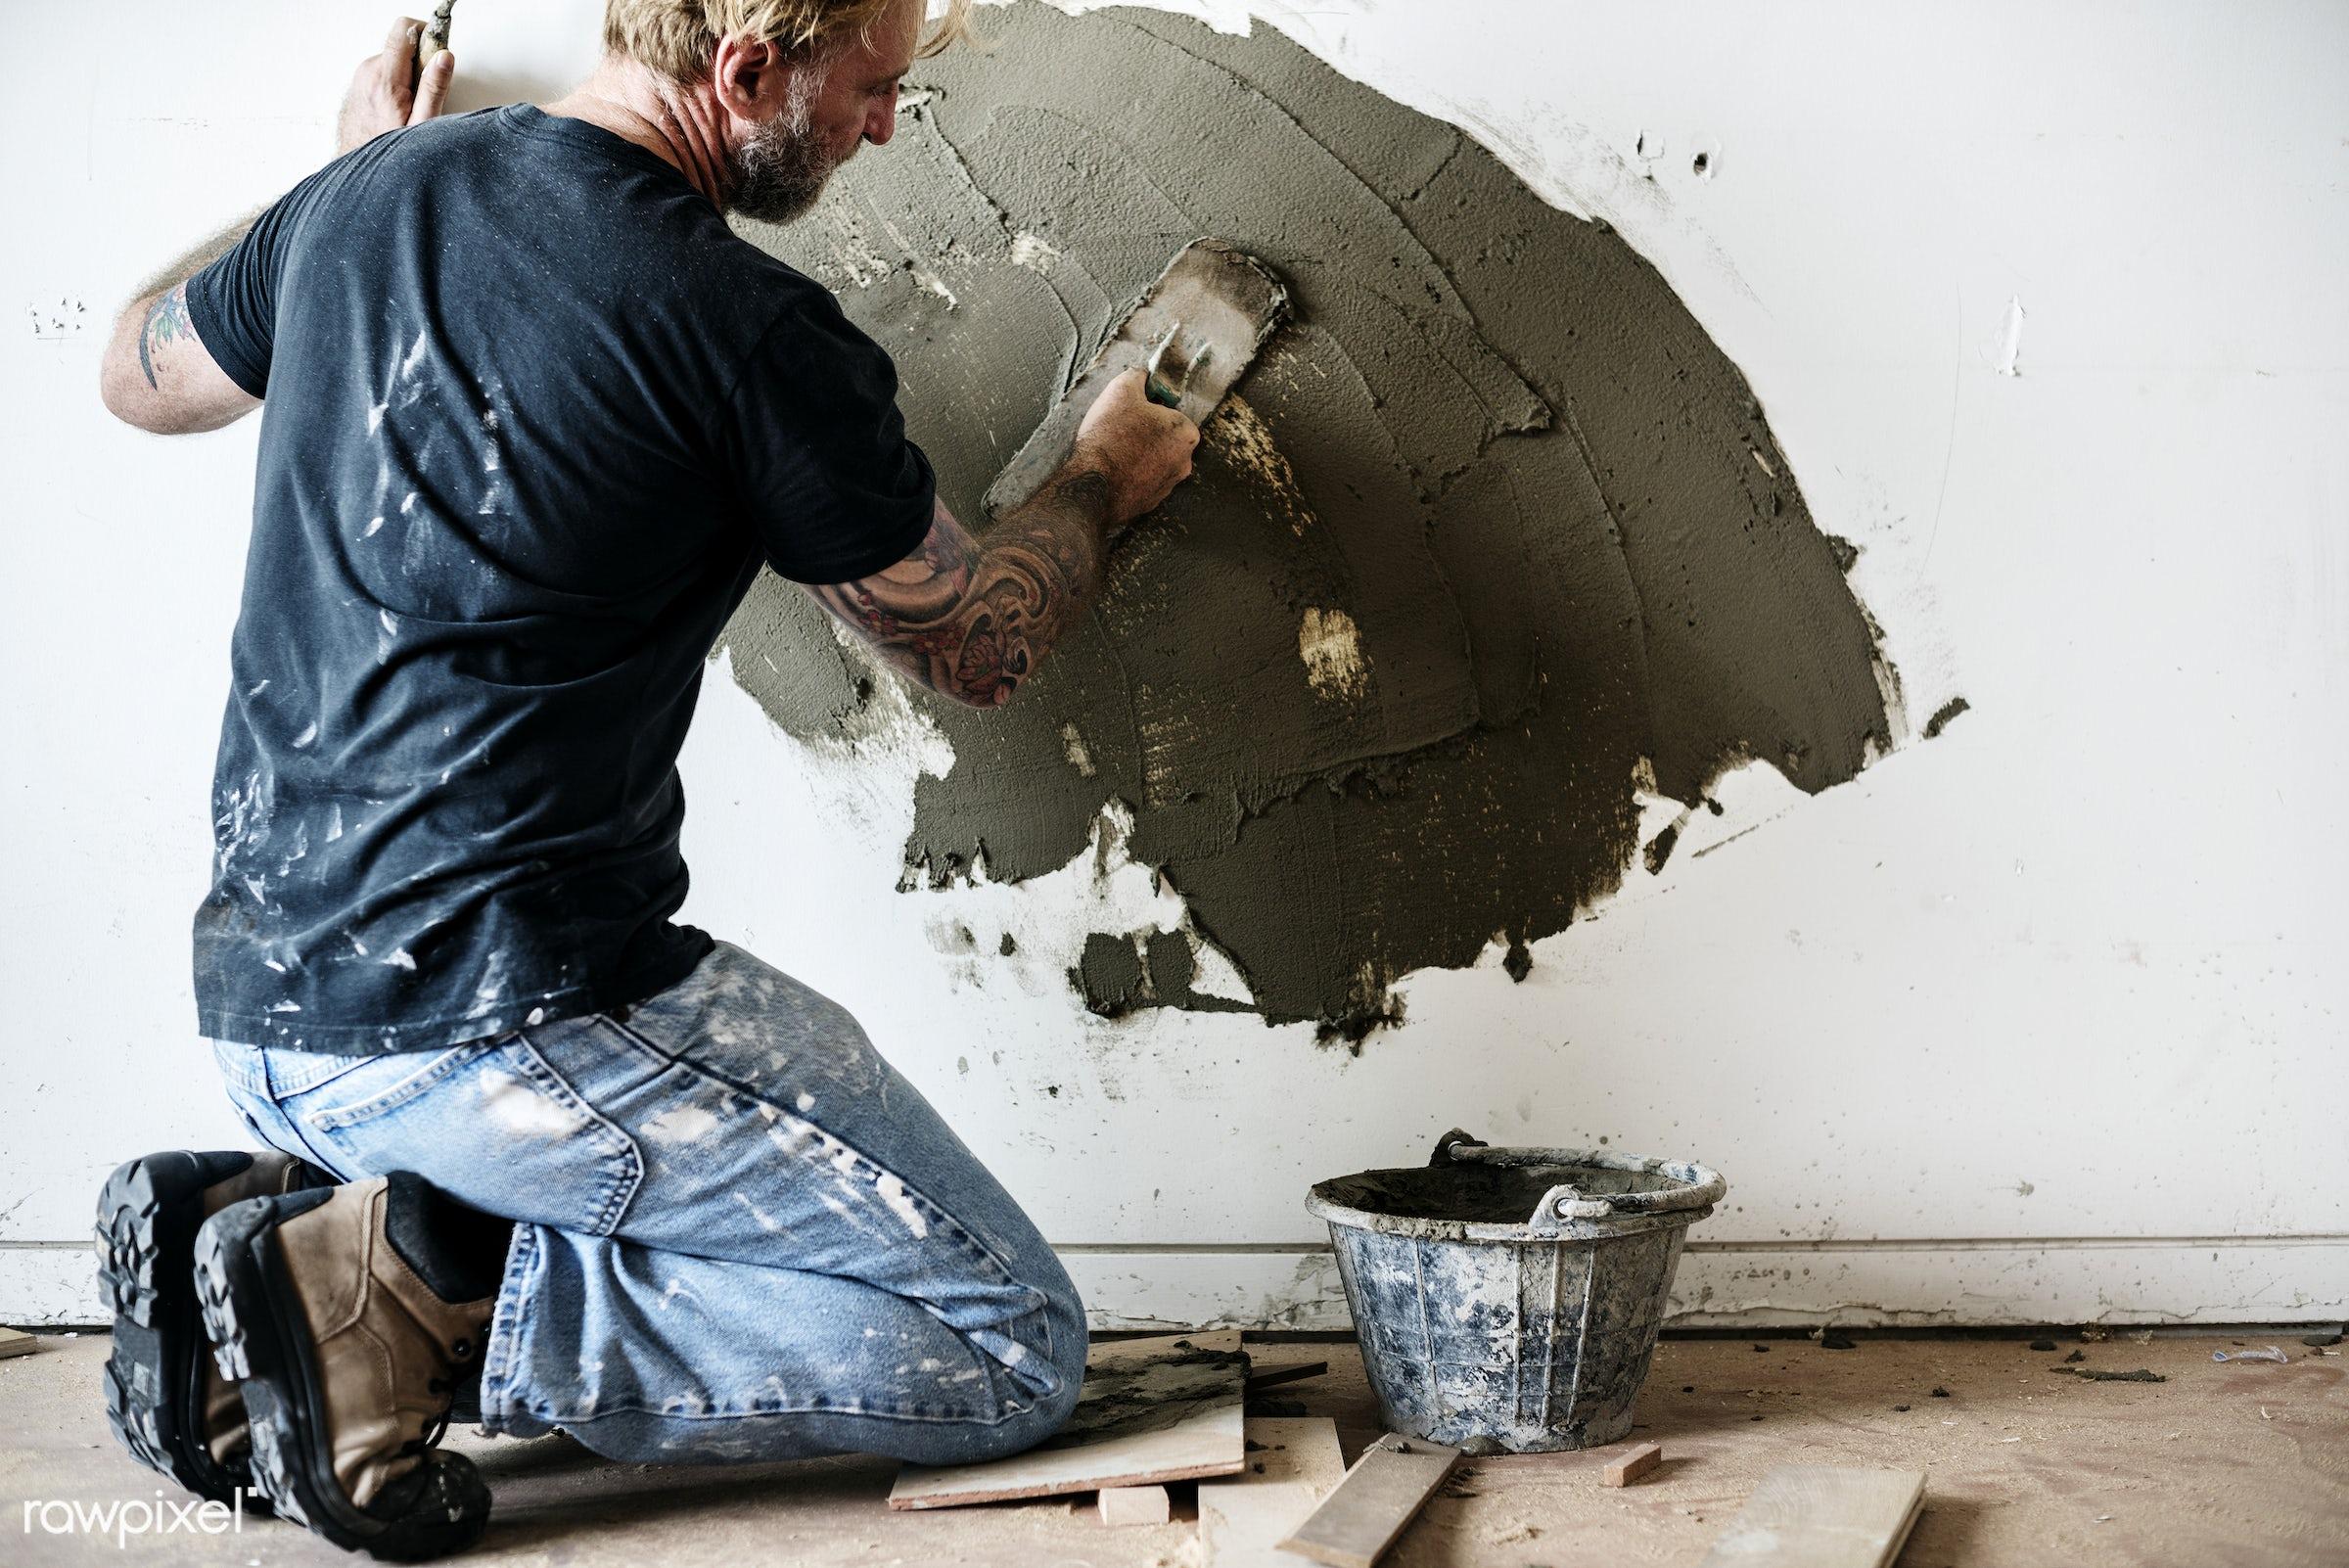 repair, work, construction, cement, concrete, equipment, grout, indoor, job, man, mason, material, mortar, plaster,...